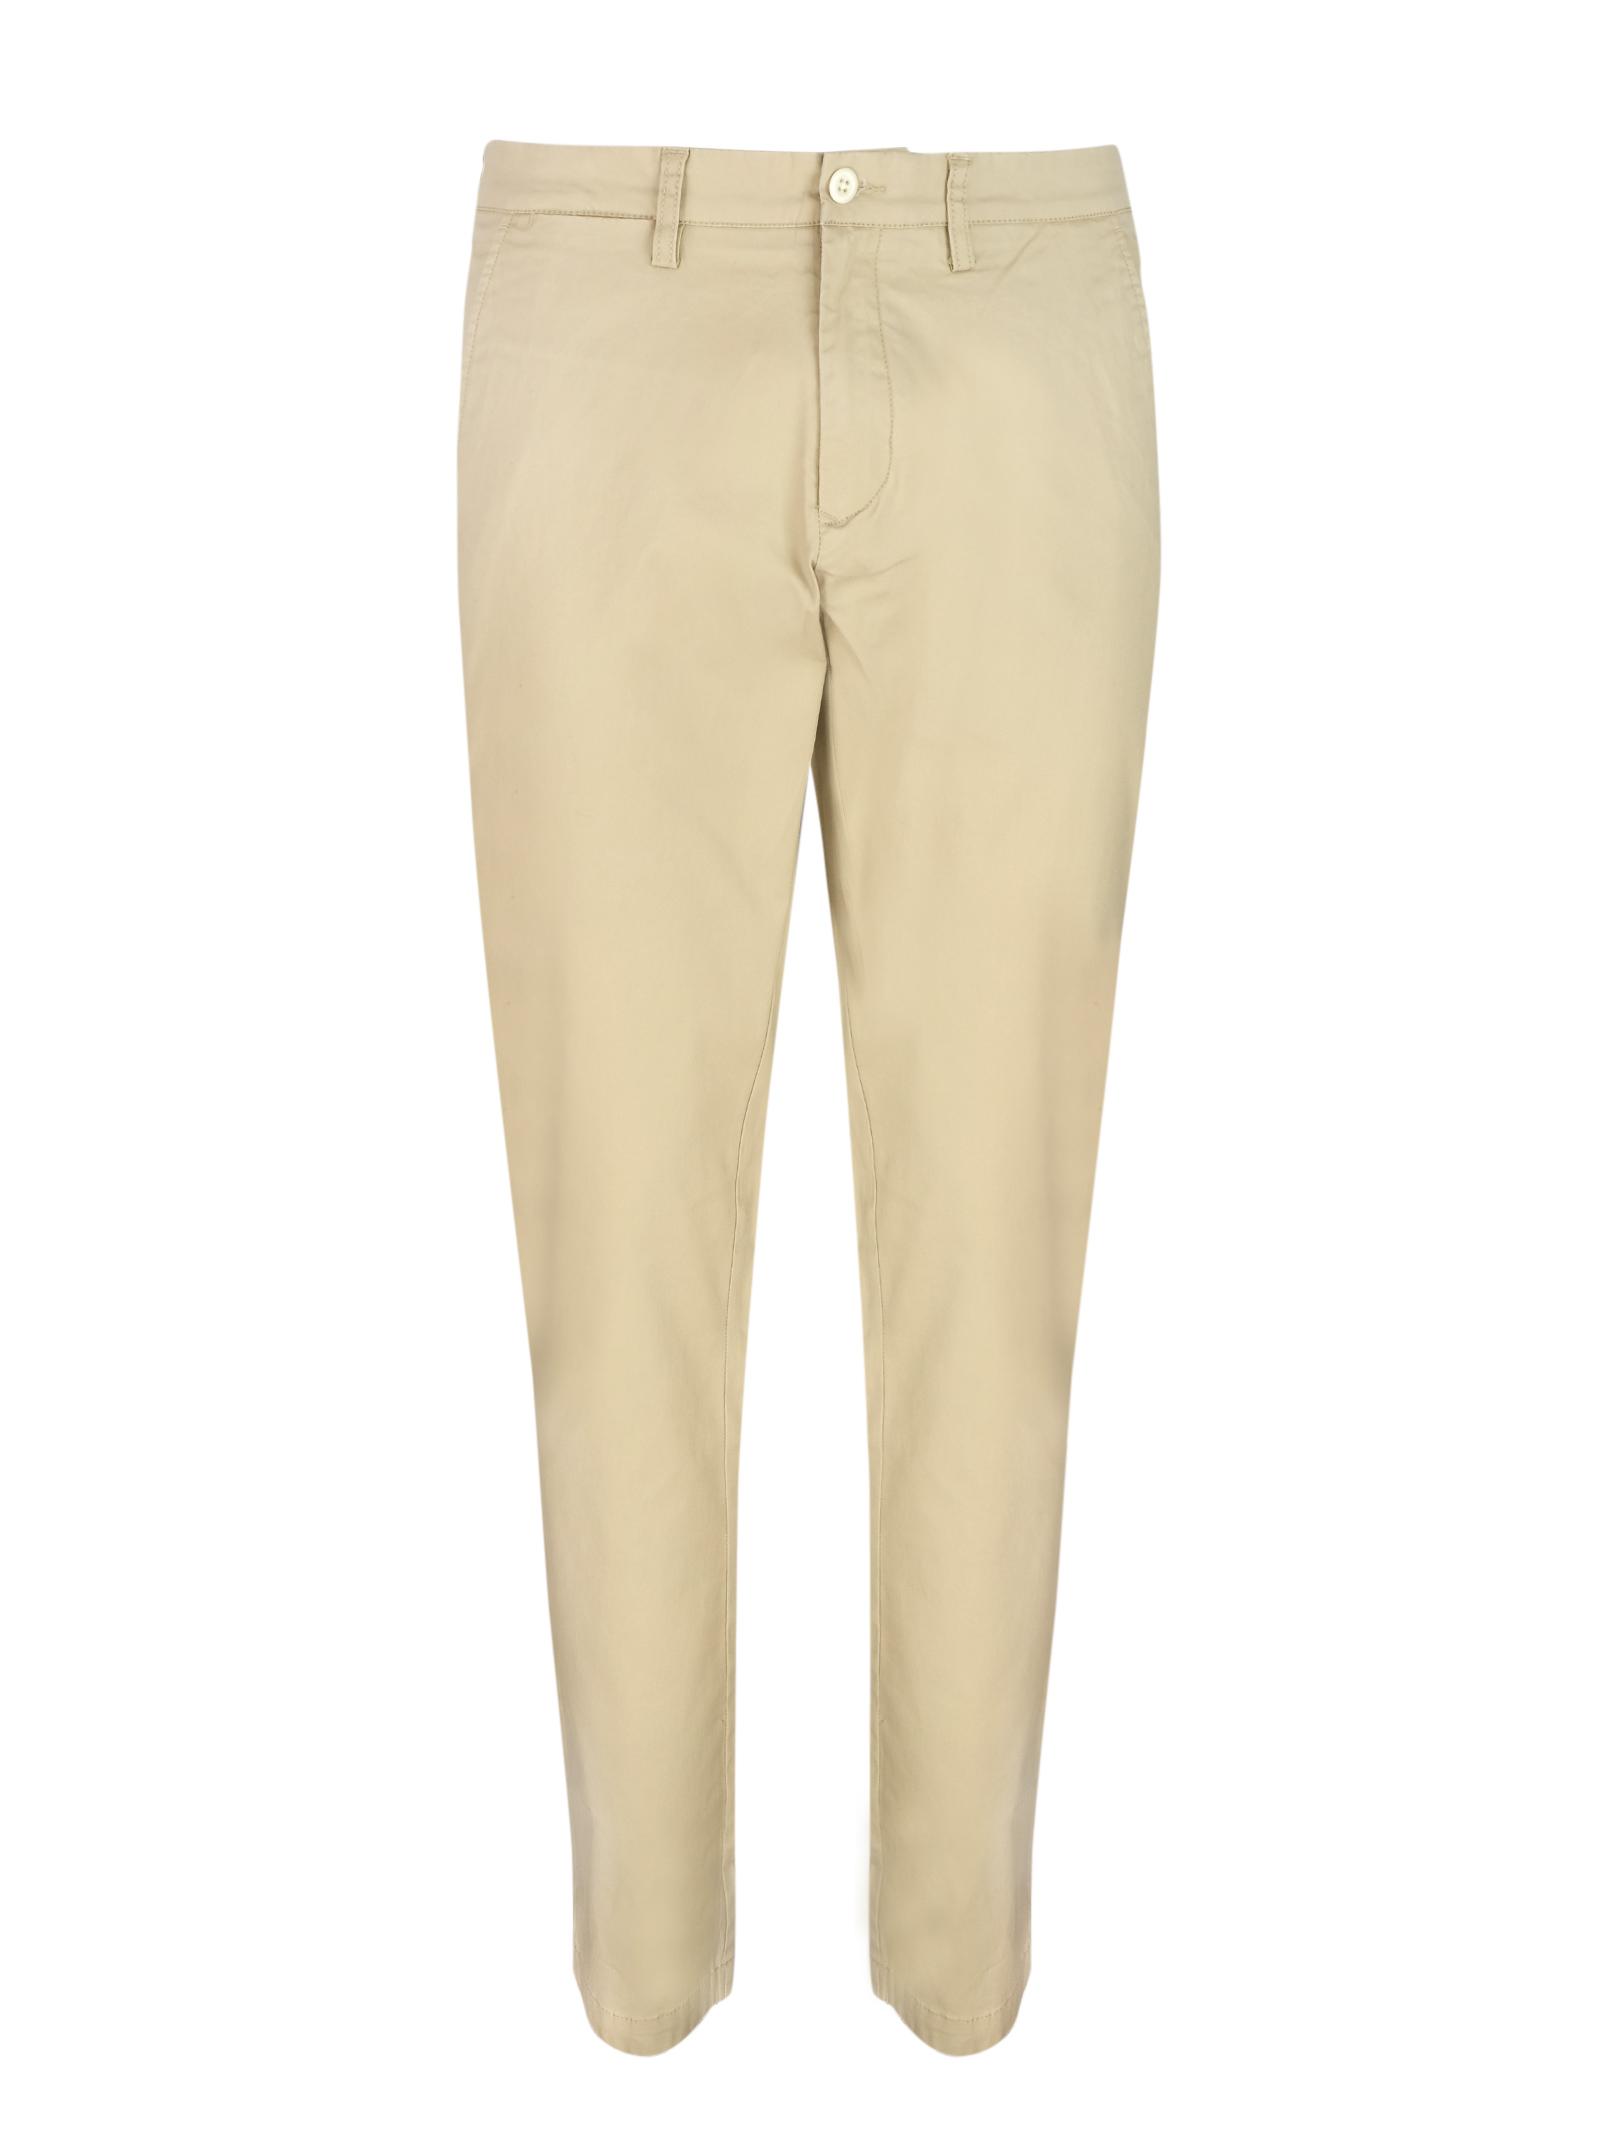 Pantaloni tasca america stone washed GANT | Pantaloni | 1500368277